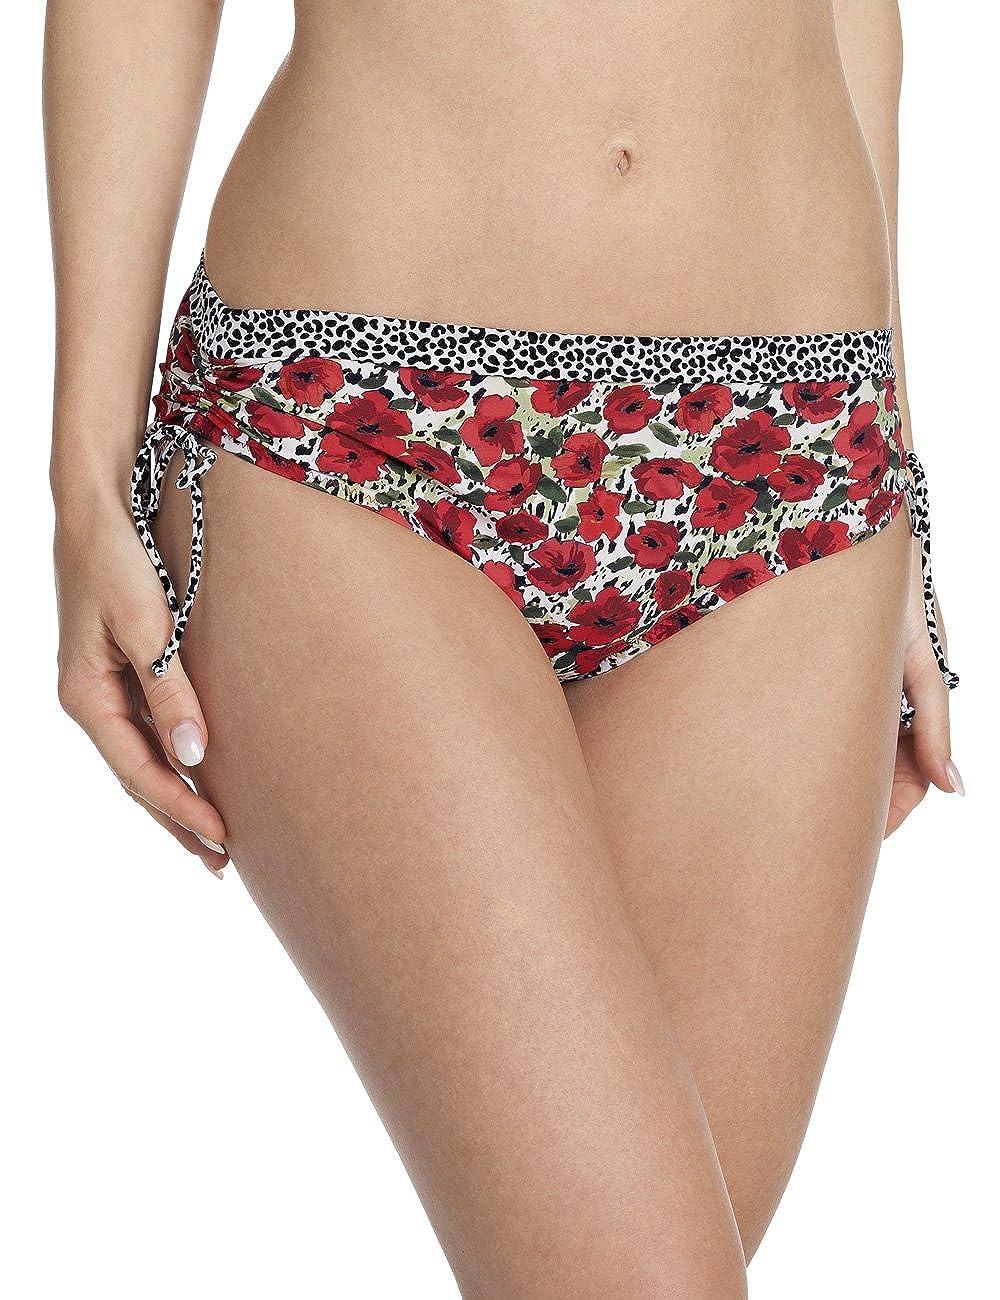 Rosa Faia Damen Bikinihose Ebru Bottom ANITA Dr Helbig GmbH L6 8720-0